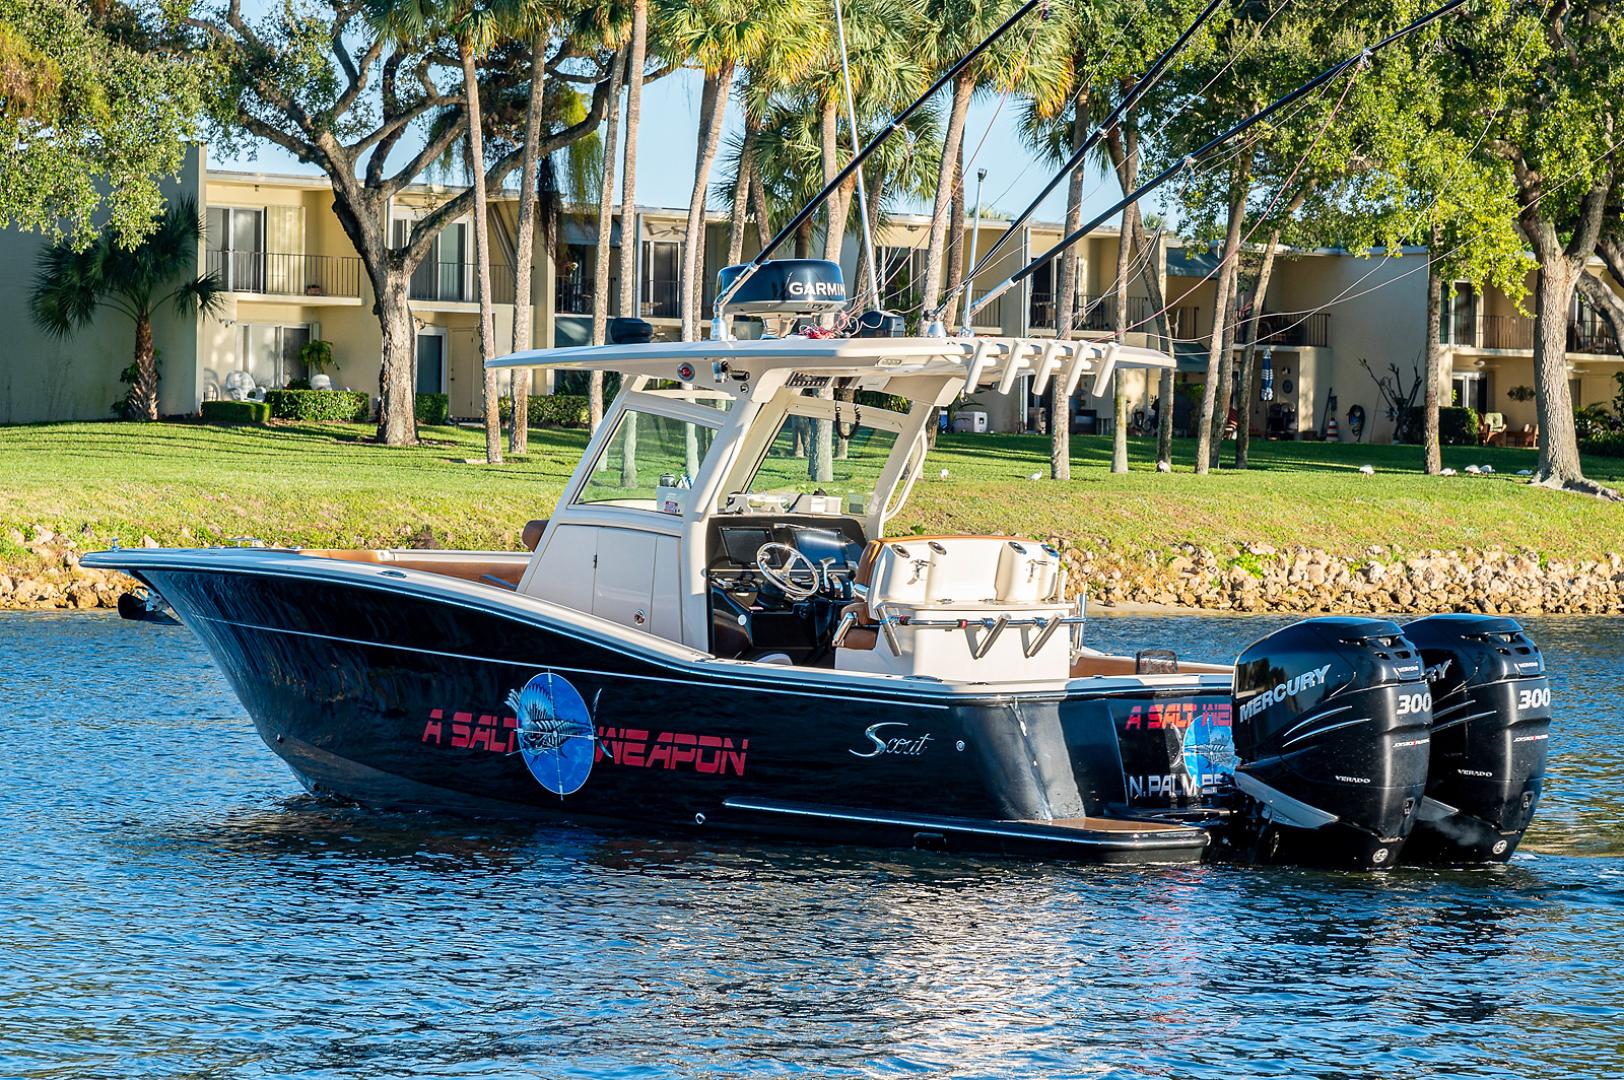 Scout-300 LXF 2017-A Salt Weapon Palm Beach Gardens-Florida-United States-A Salt Weapon-1571117 | Thumbnail